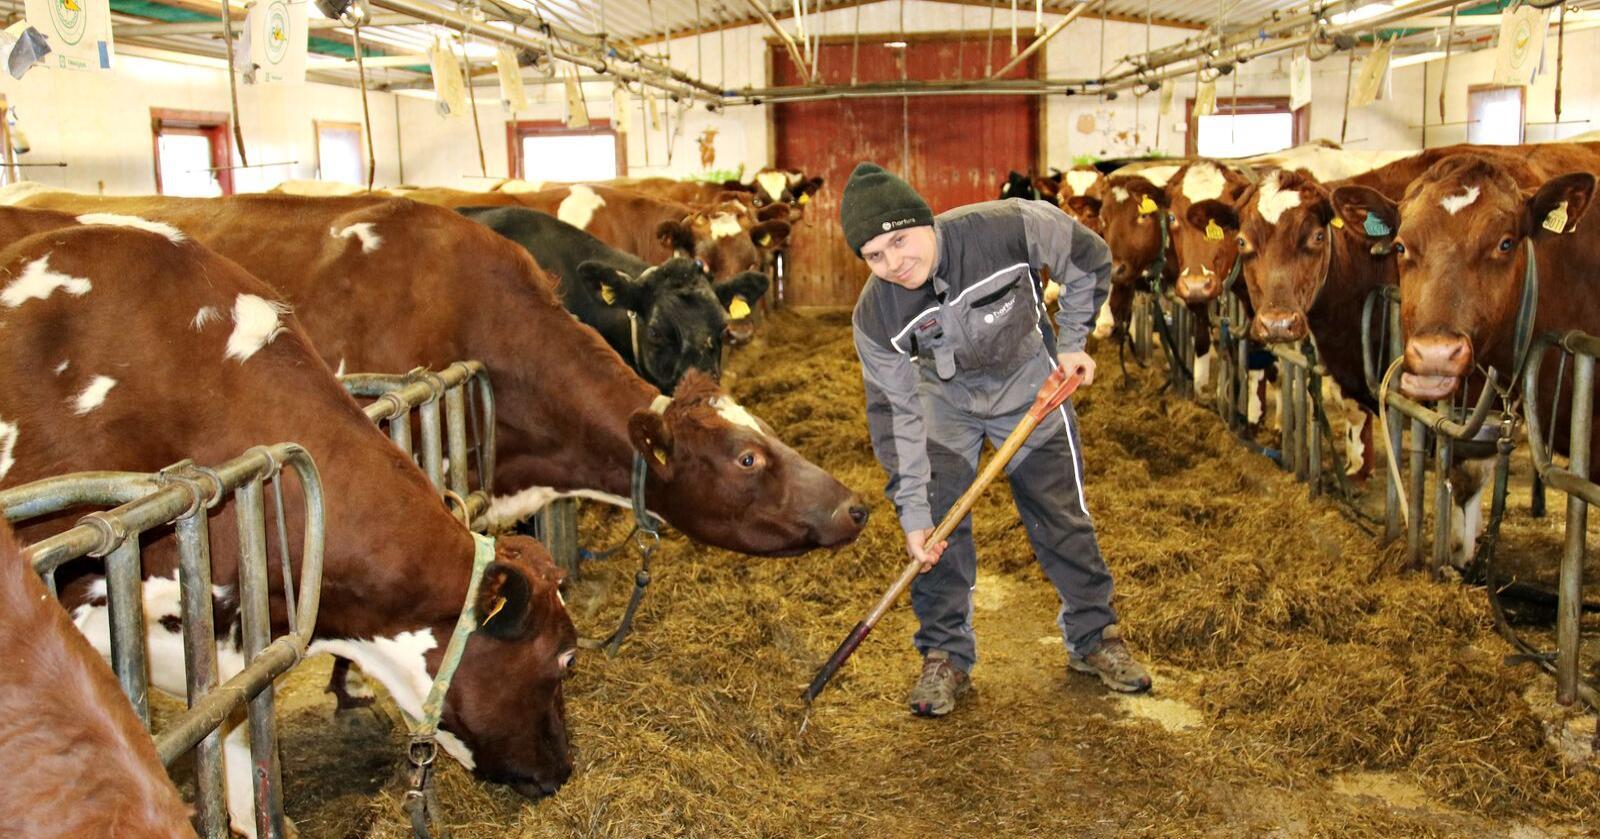 Kåret: Øistein Aasen fra Tolga er Årets unge bonde. (Foto: Lars Olav Haug)